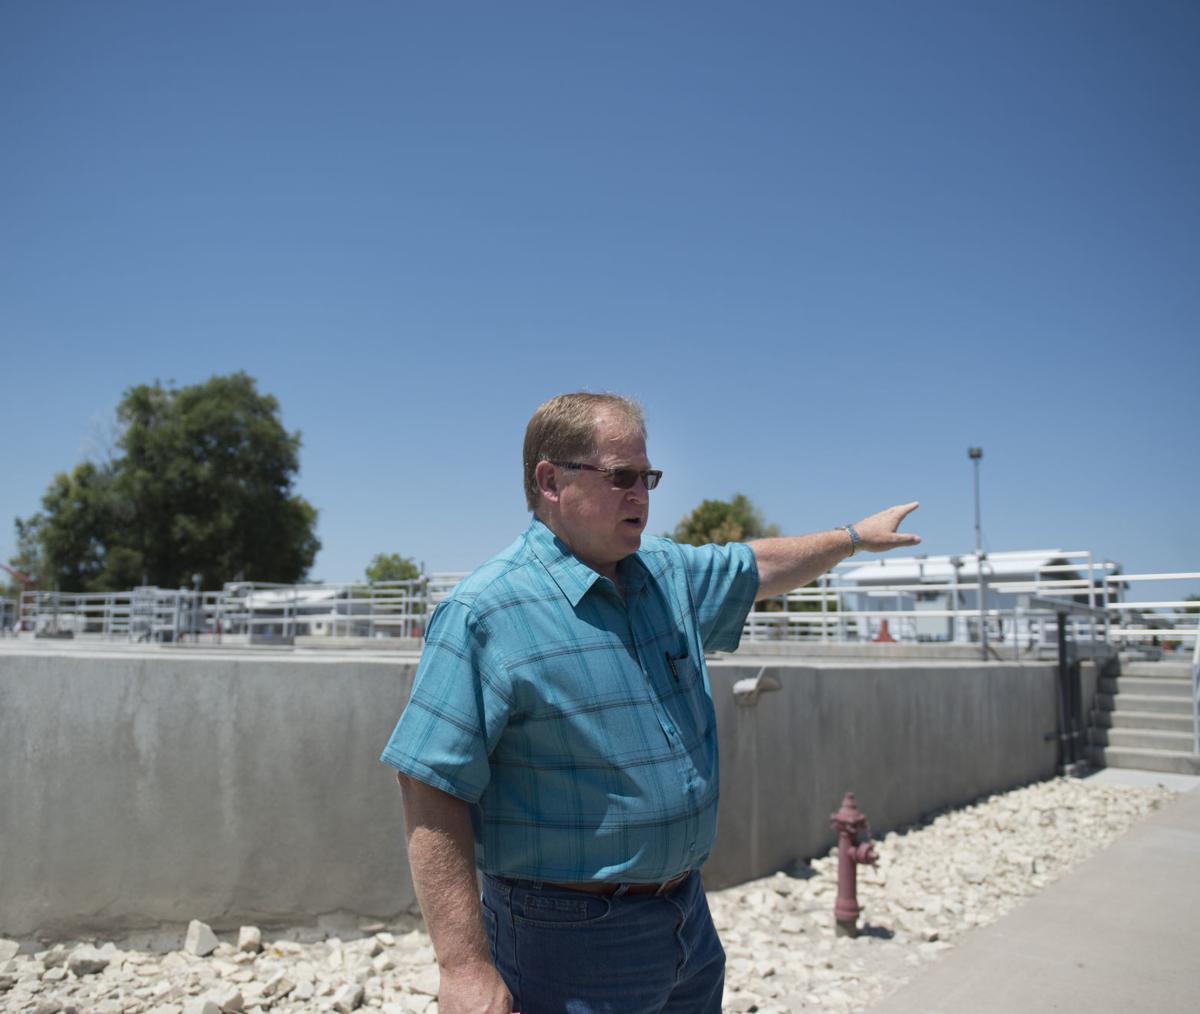 Heyburn Wastewater Treatment Facility